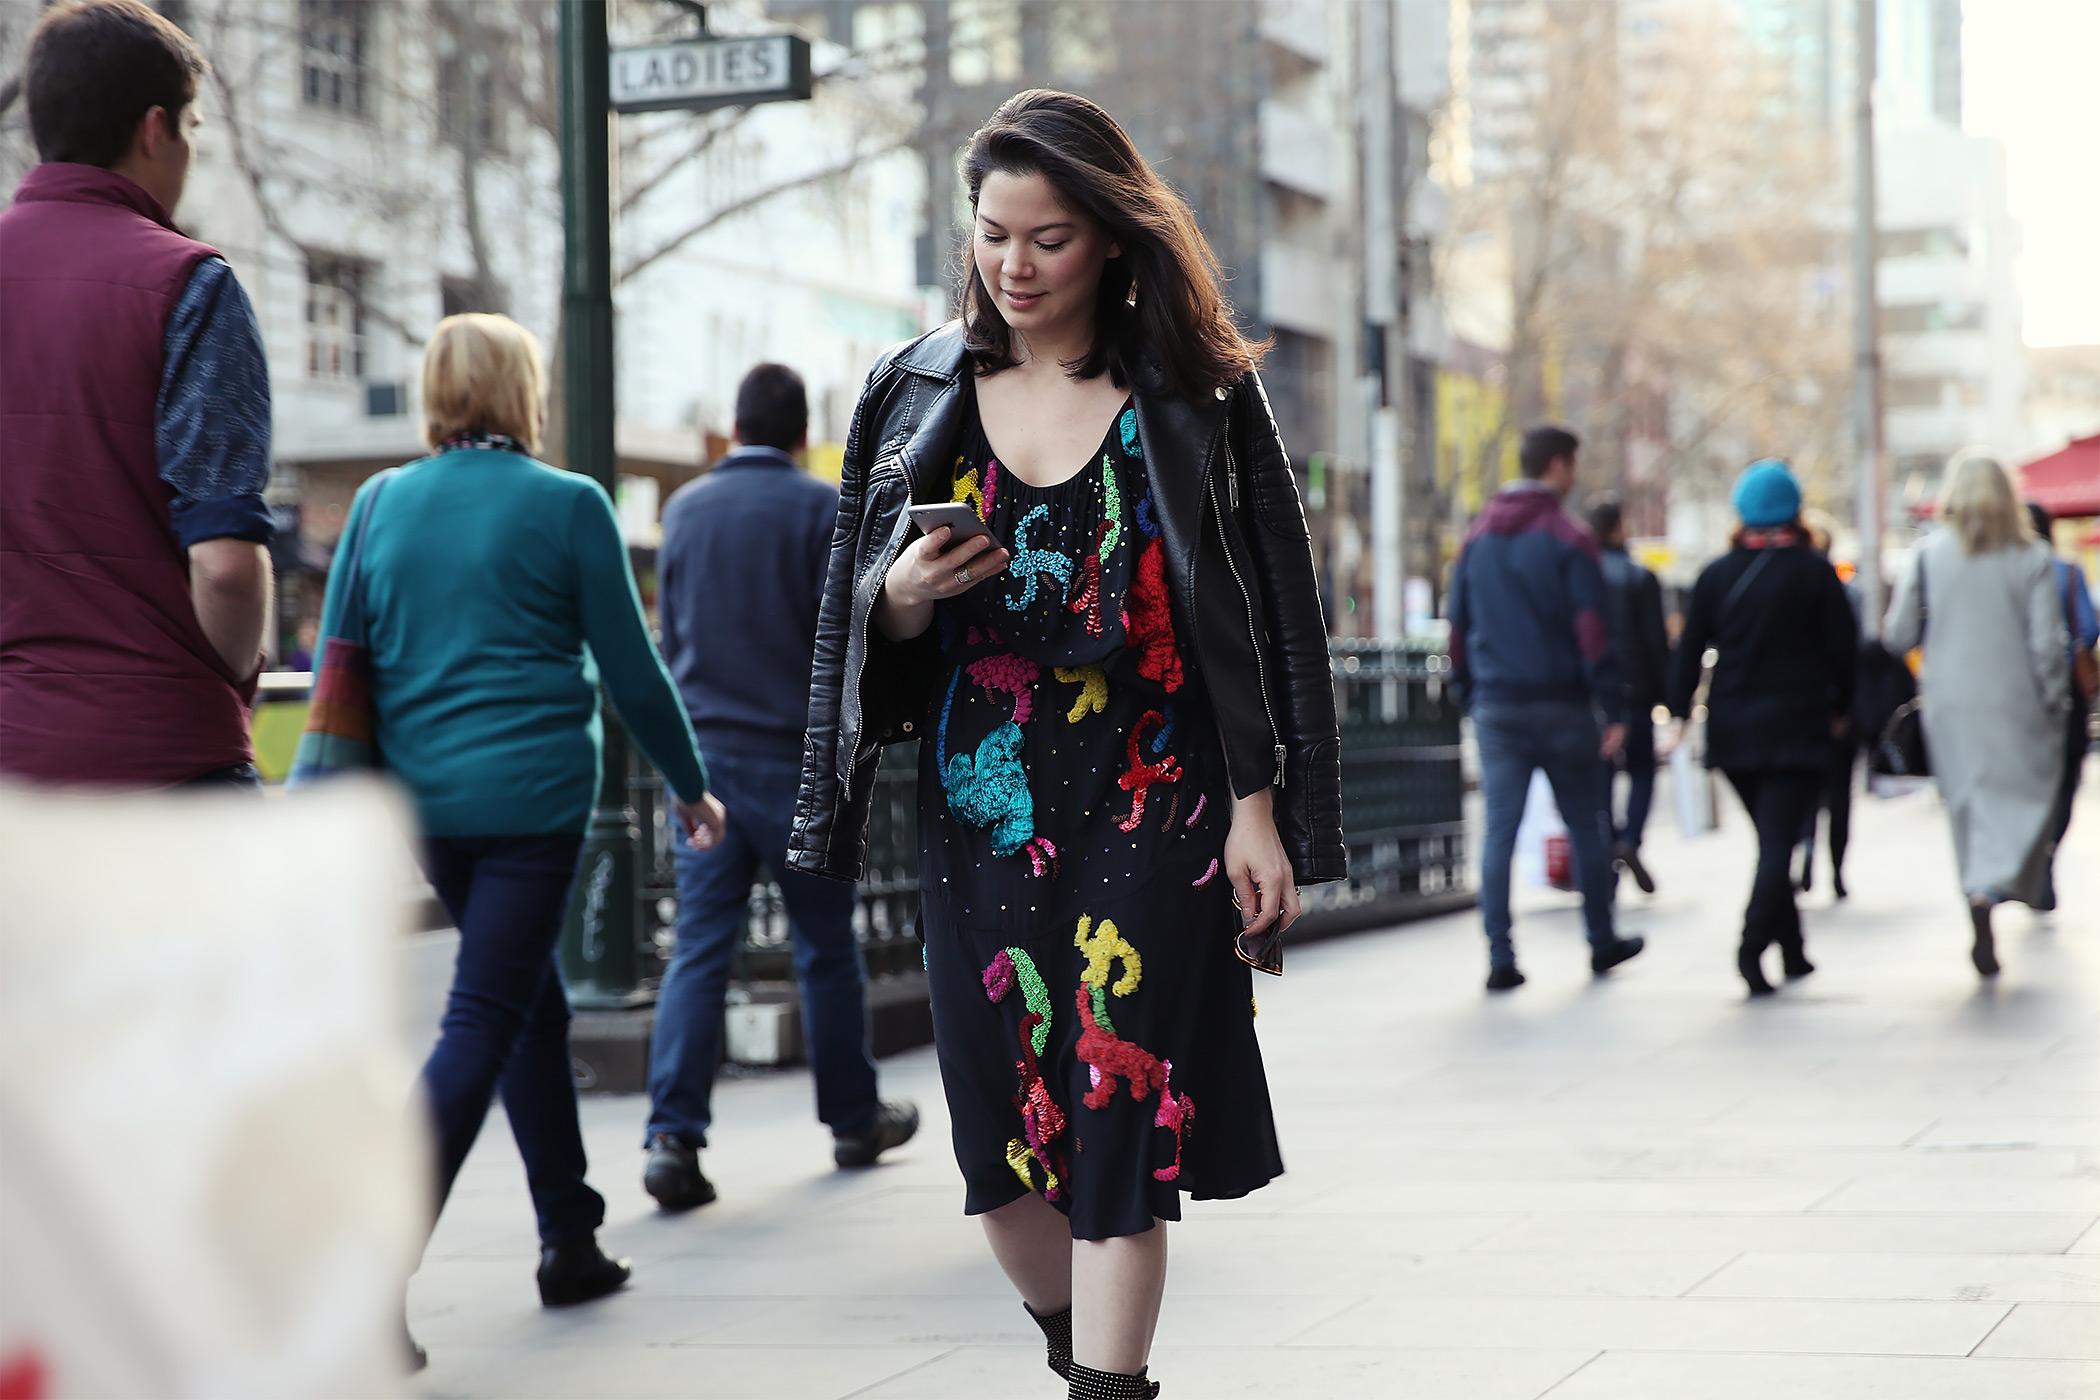 Transeasonal outfits Lei Lady Lei Blogger Fashion